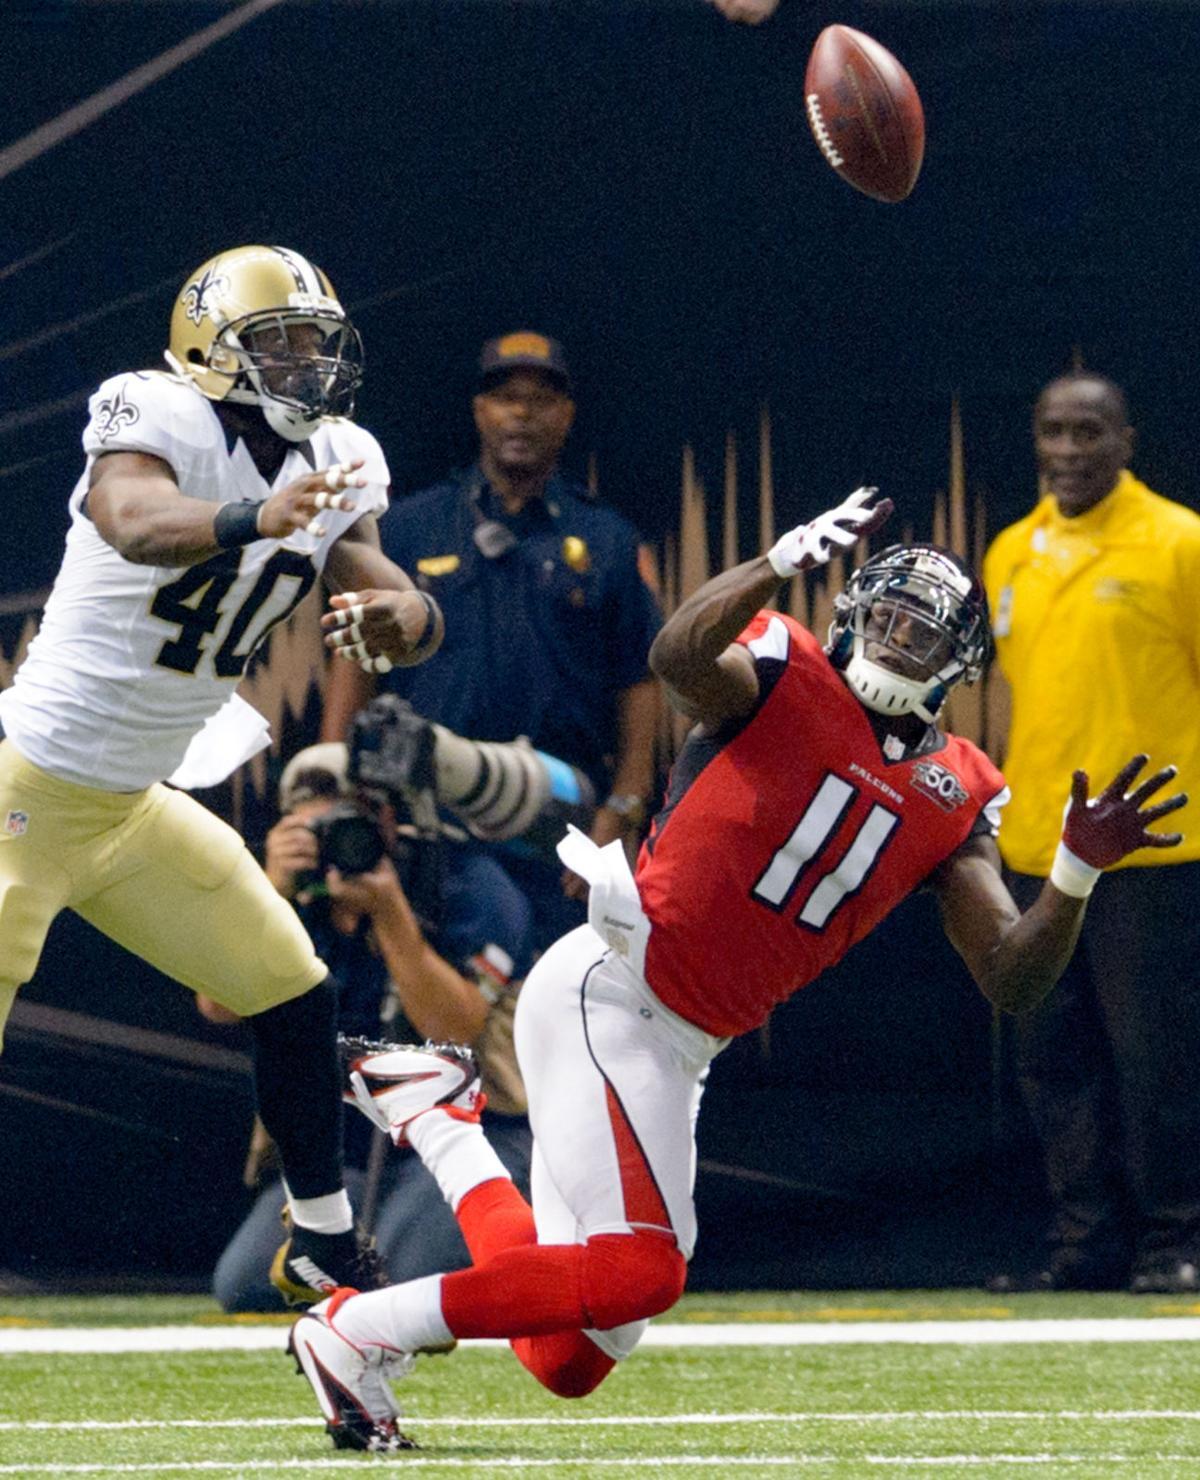 New Orleans Saints cornerback Delvin Breaux feels pretty good